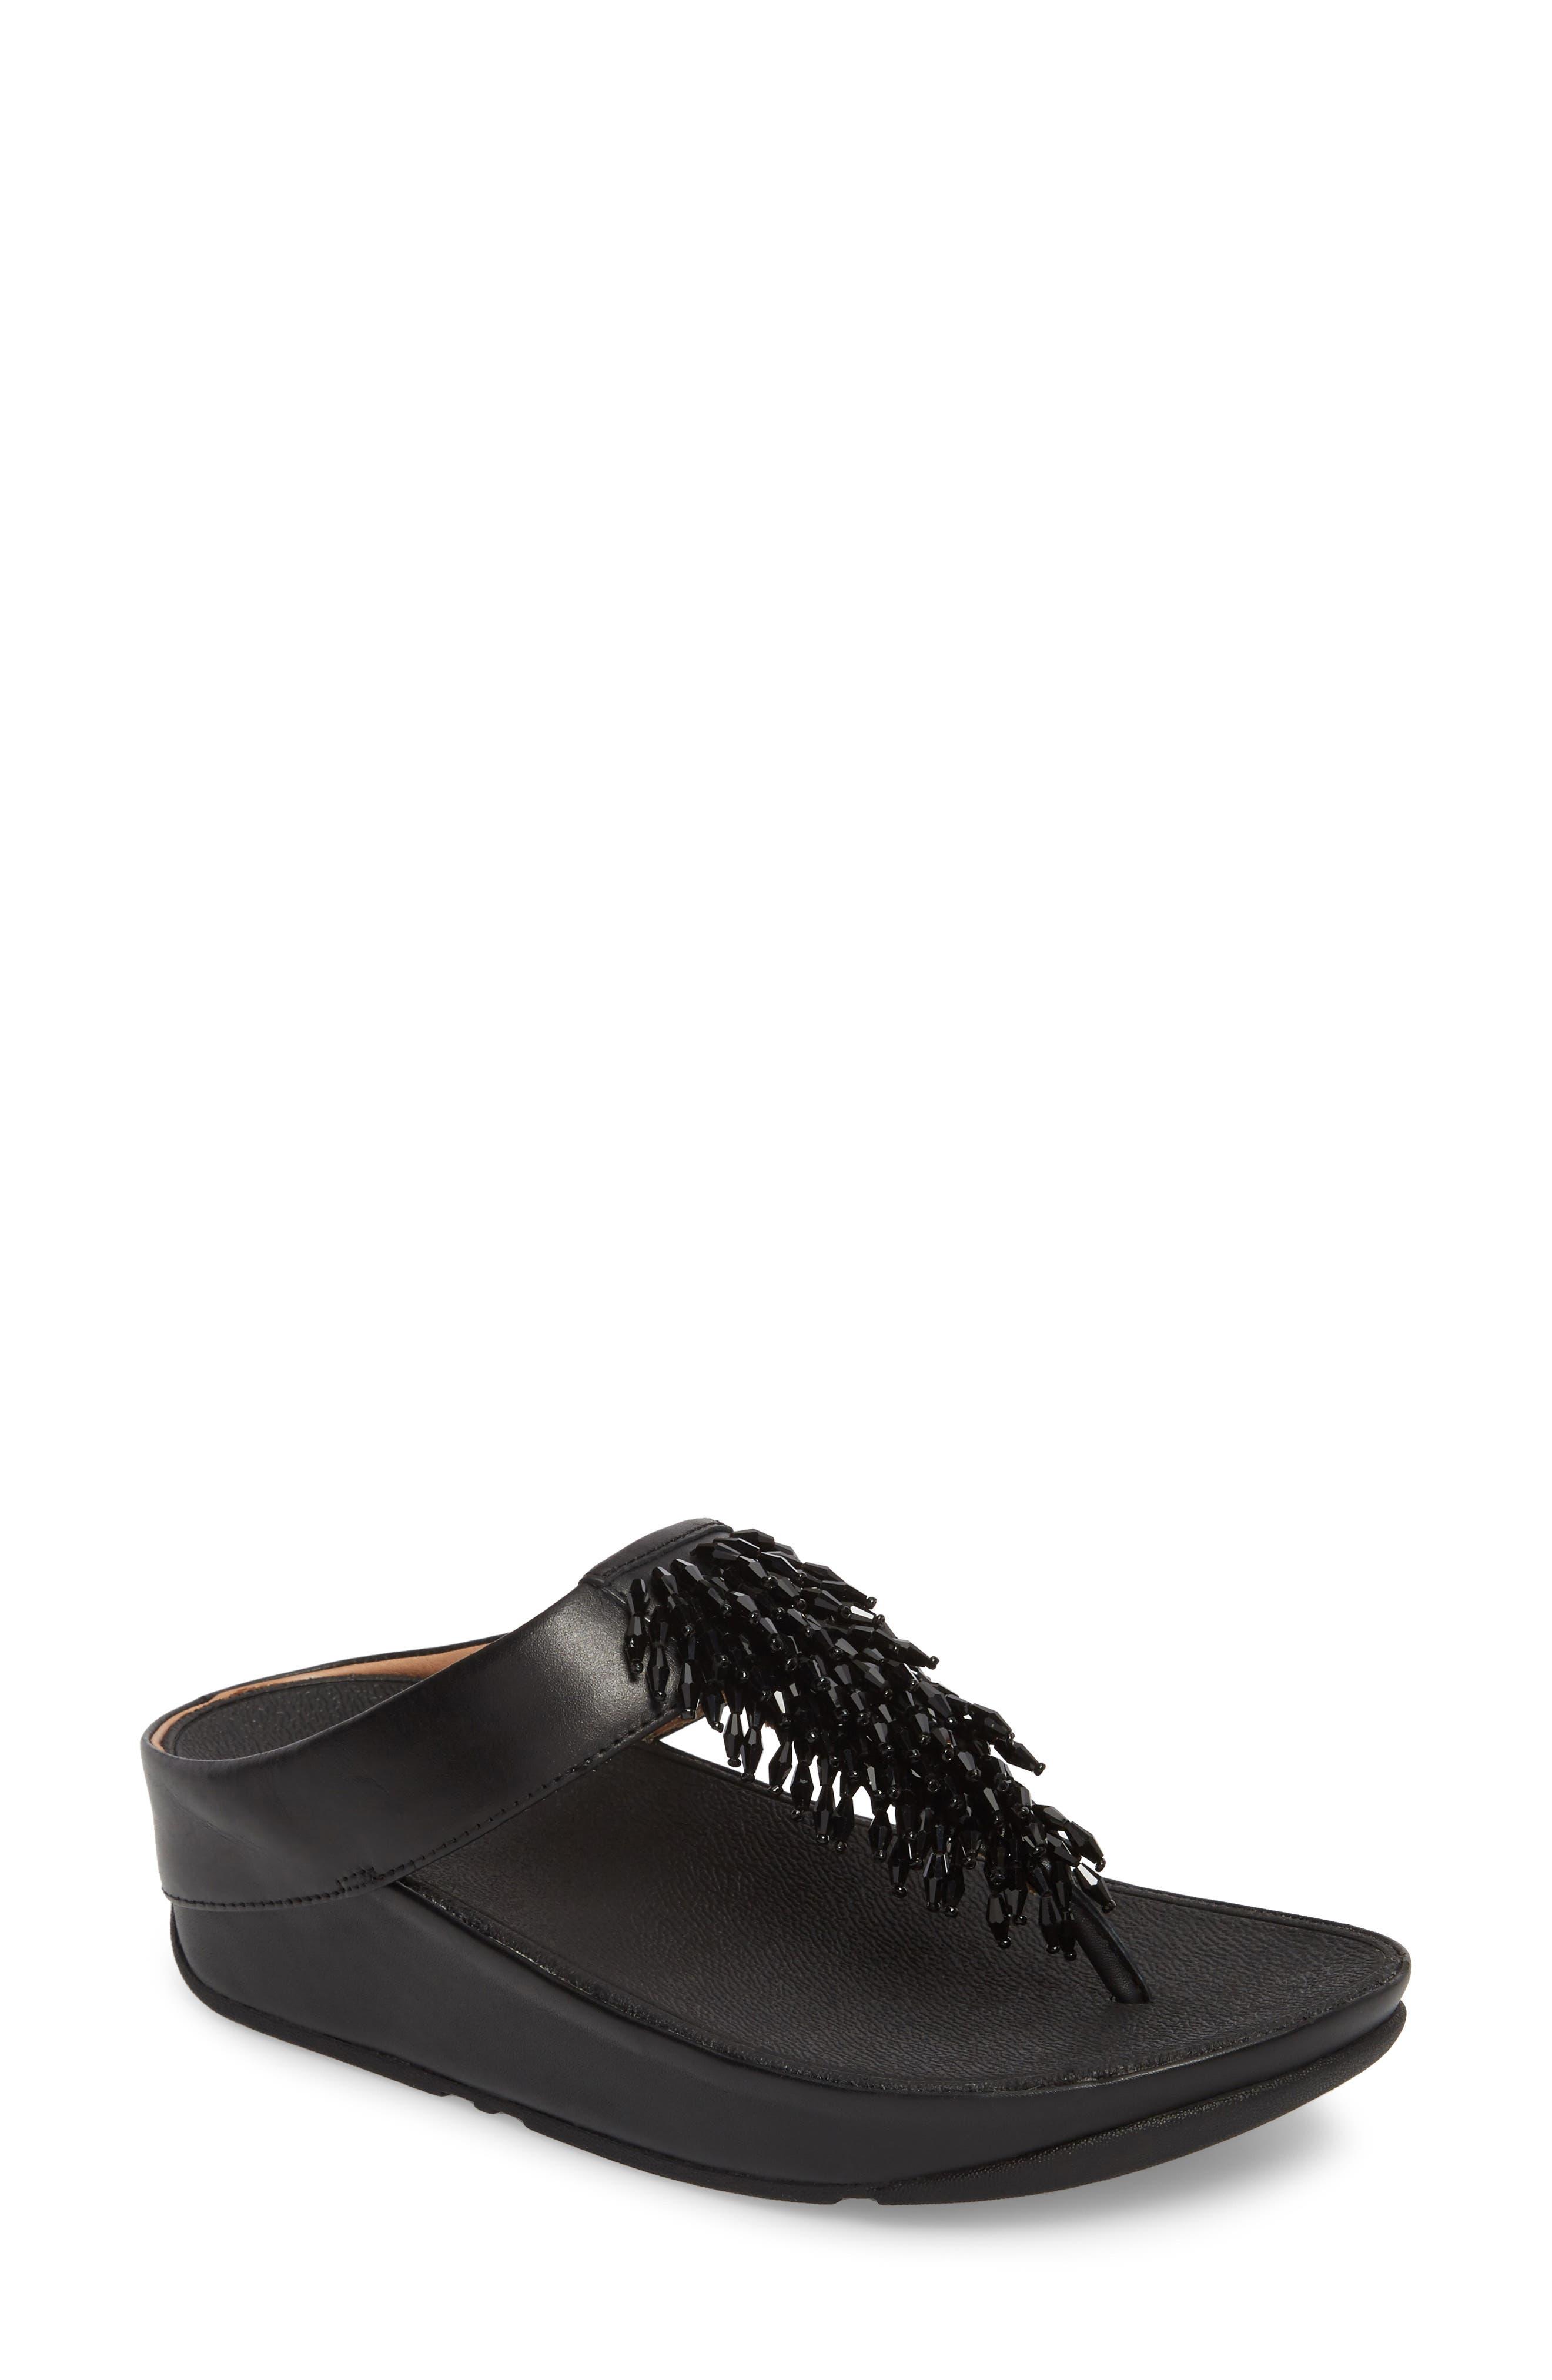 Fitflop Rumba Sandal